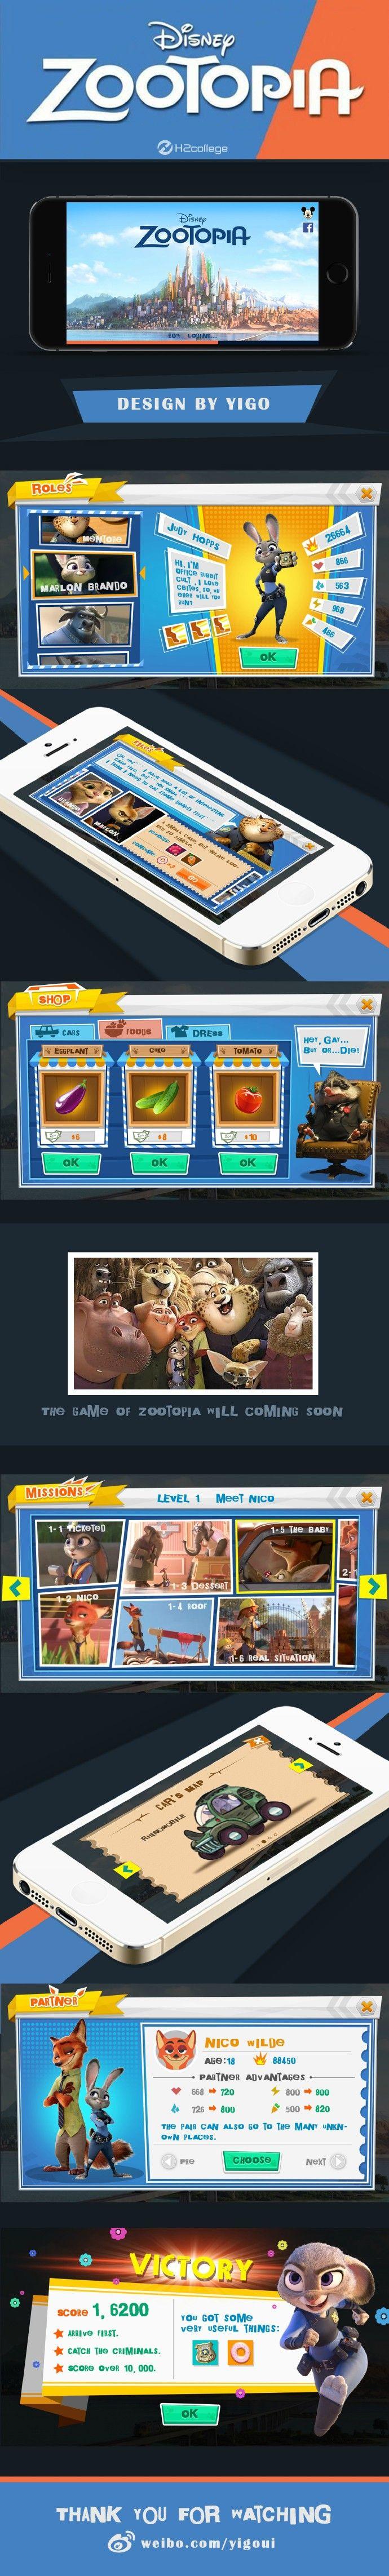 《zootopia》game ui design